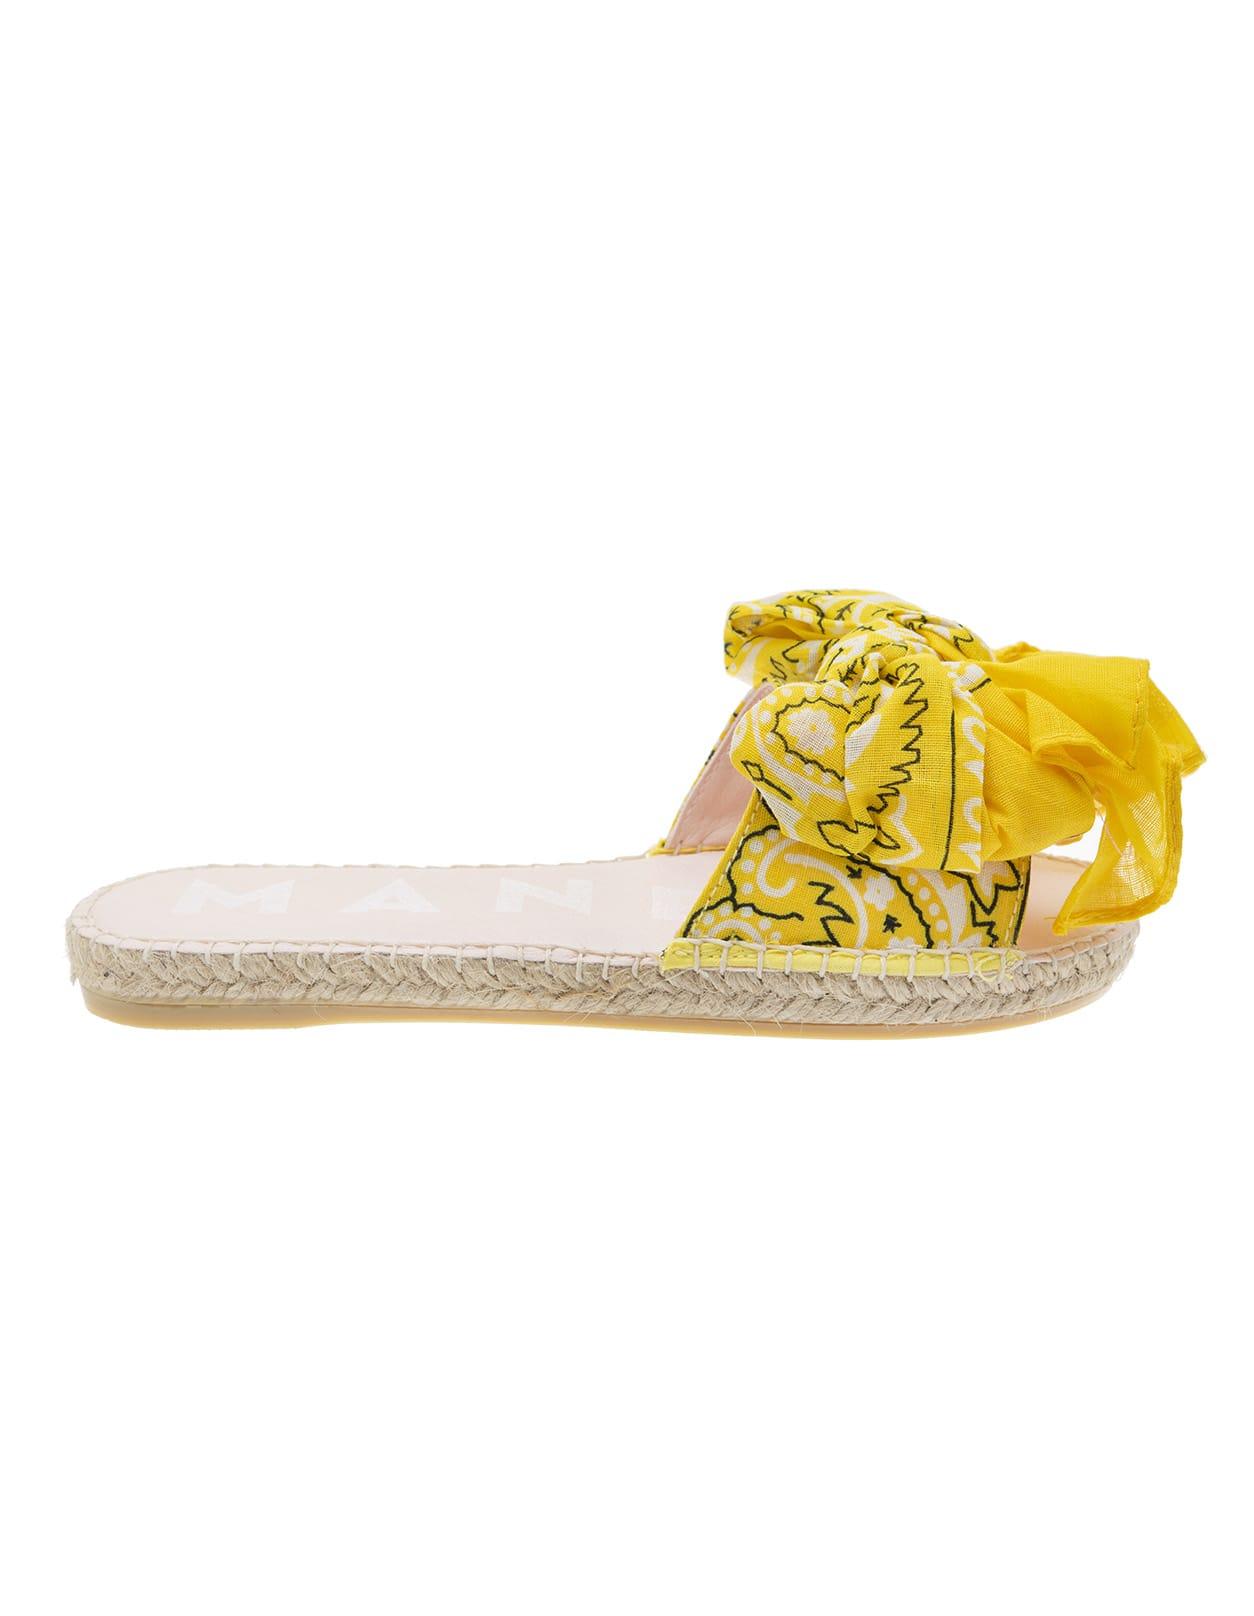 Bandana Flat Sandals With Bow Yellow